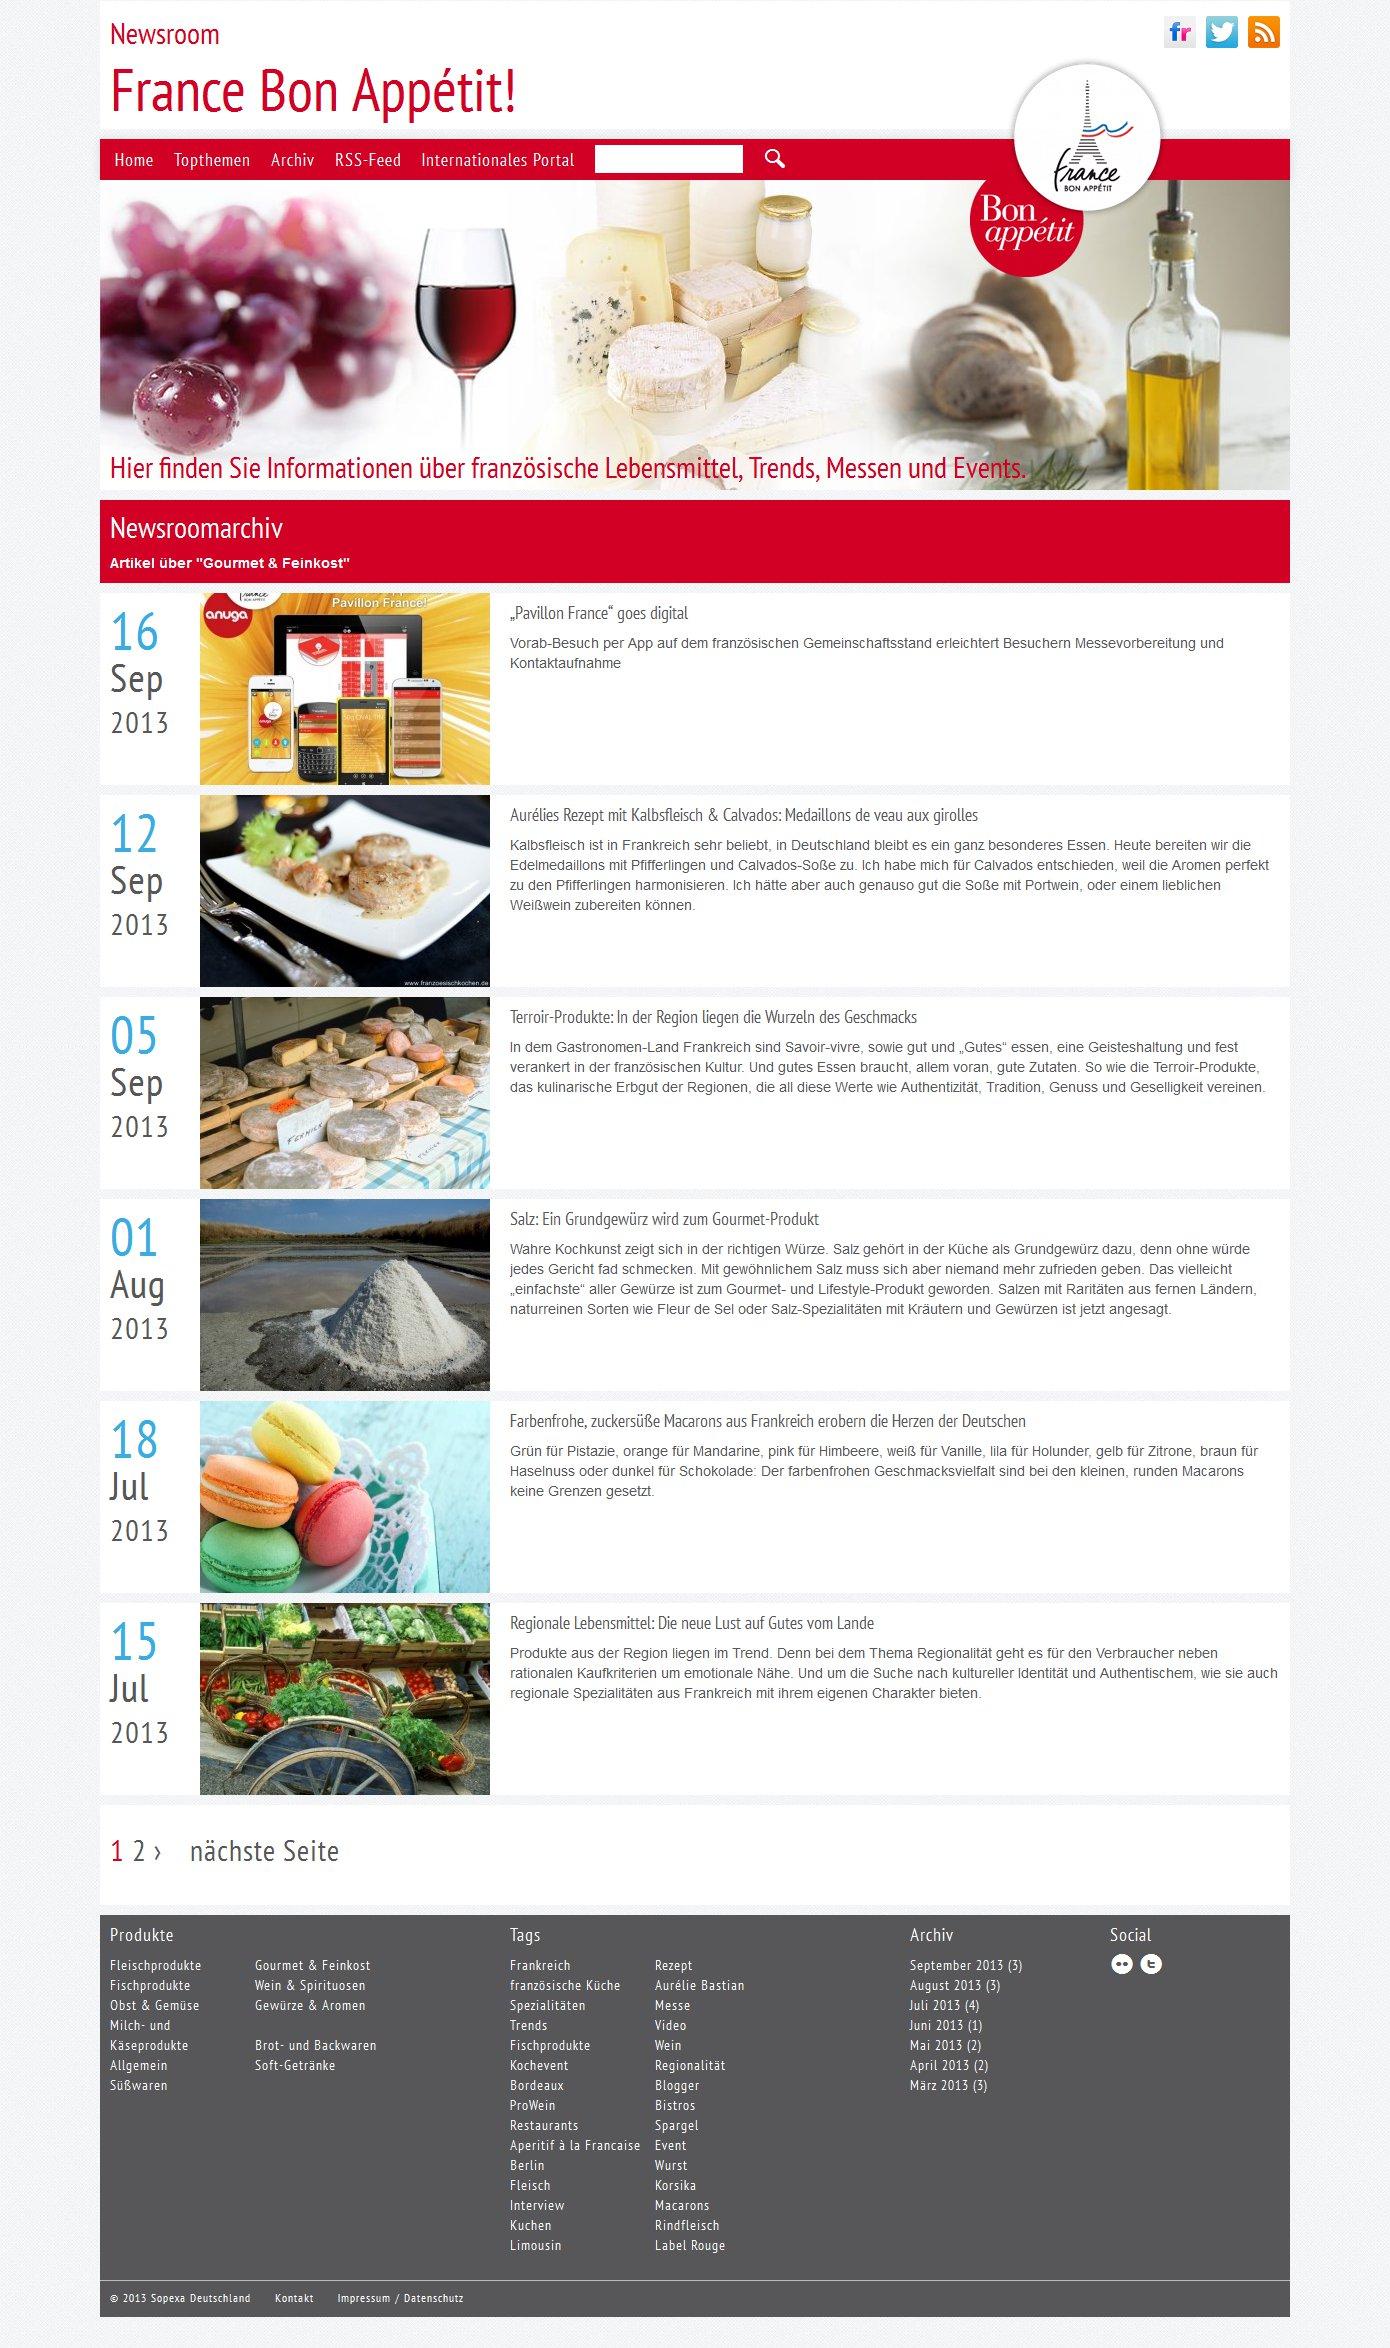 France Bon Appétit! Newsroom Artikelliste